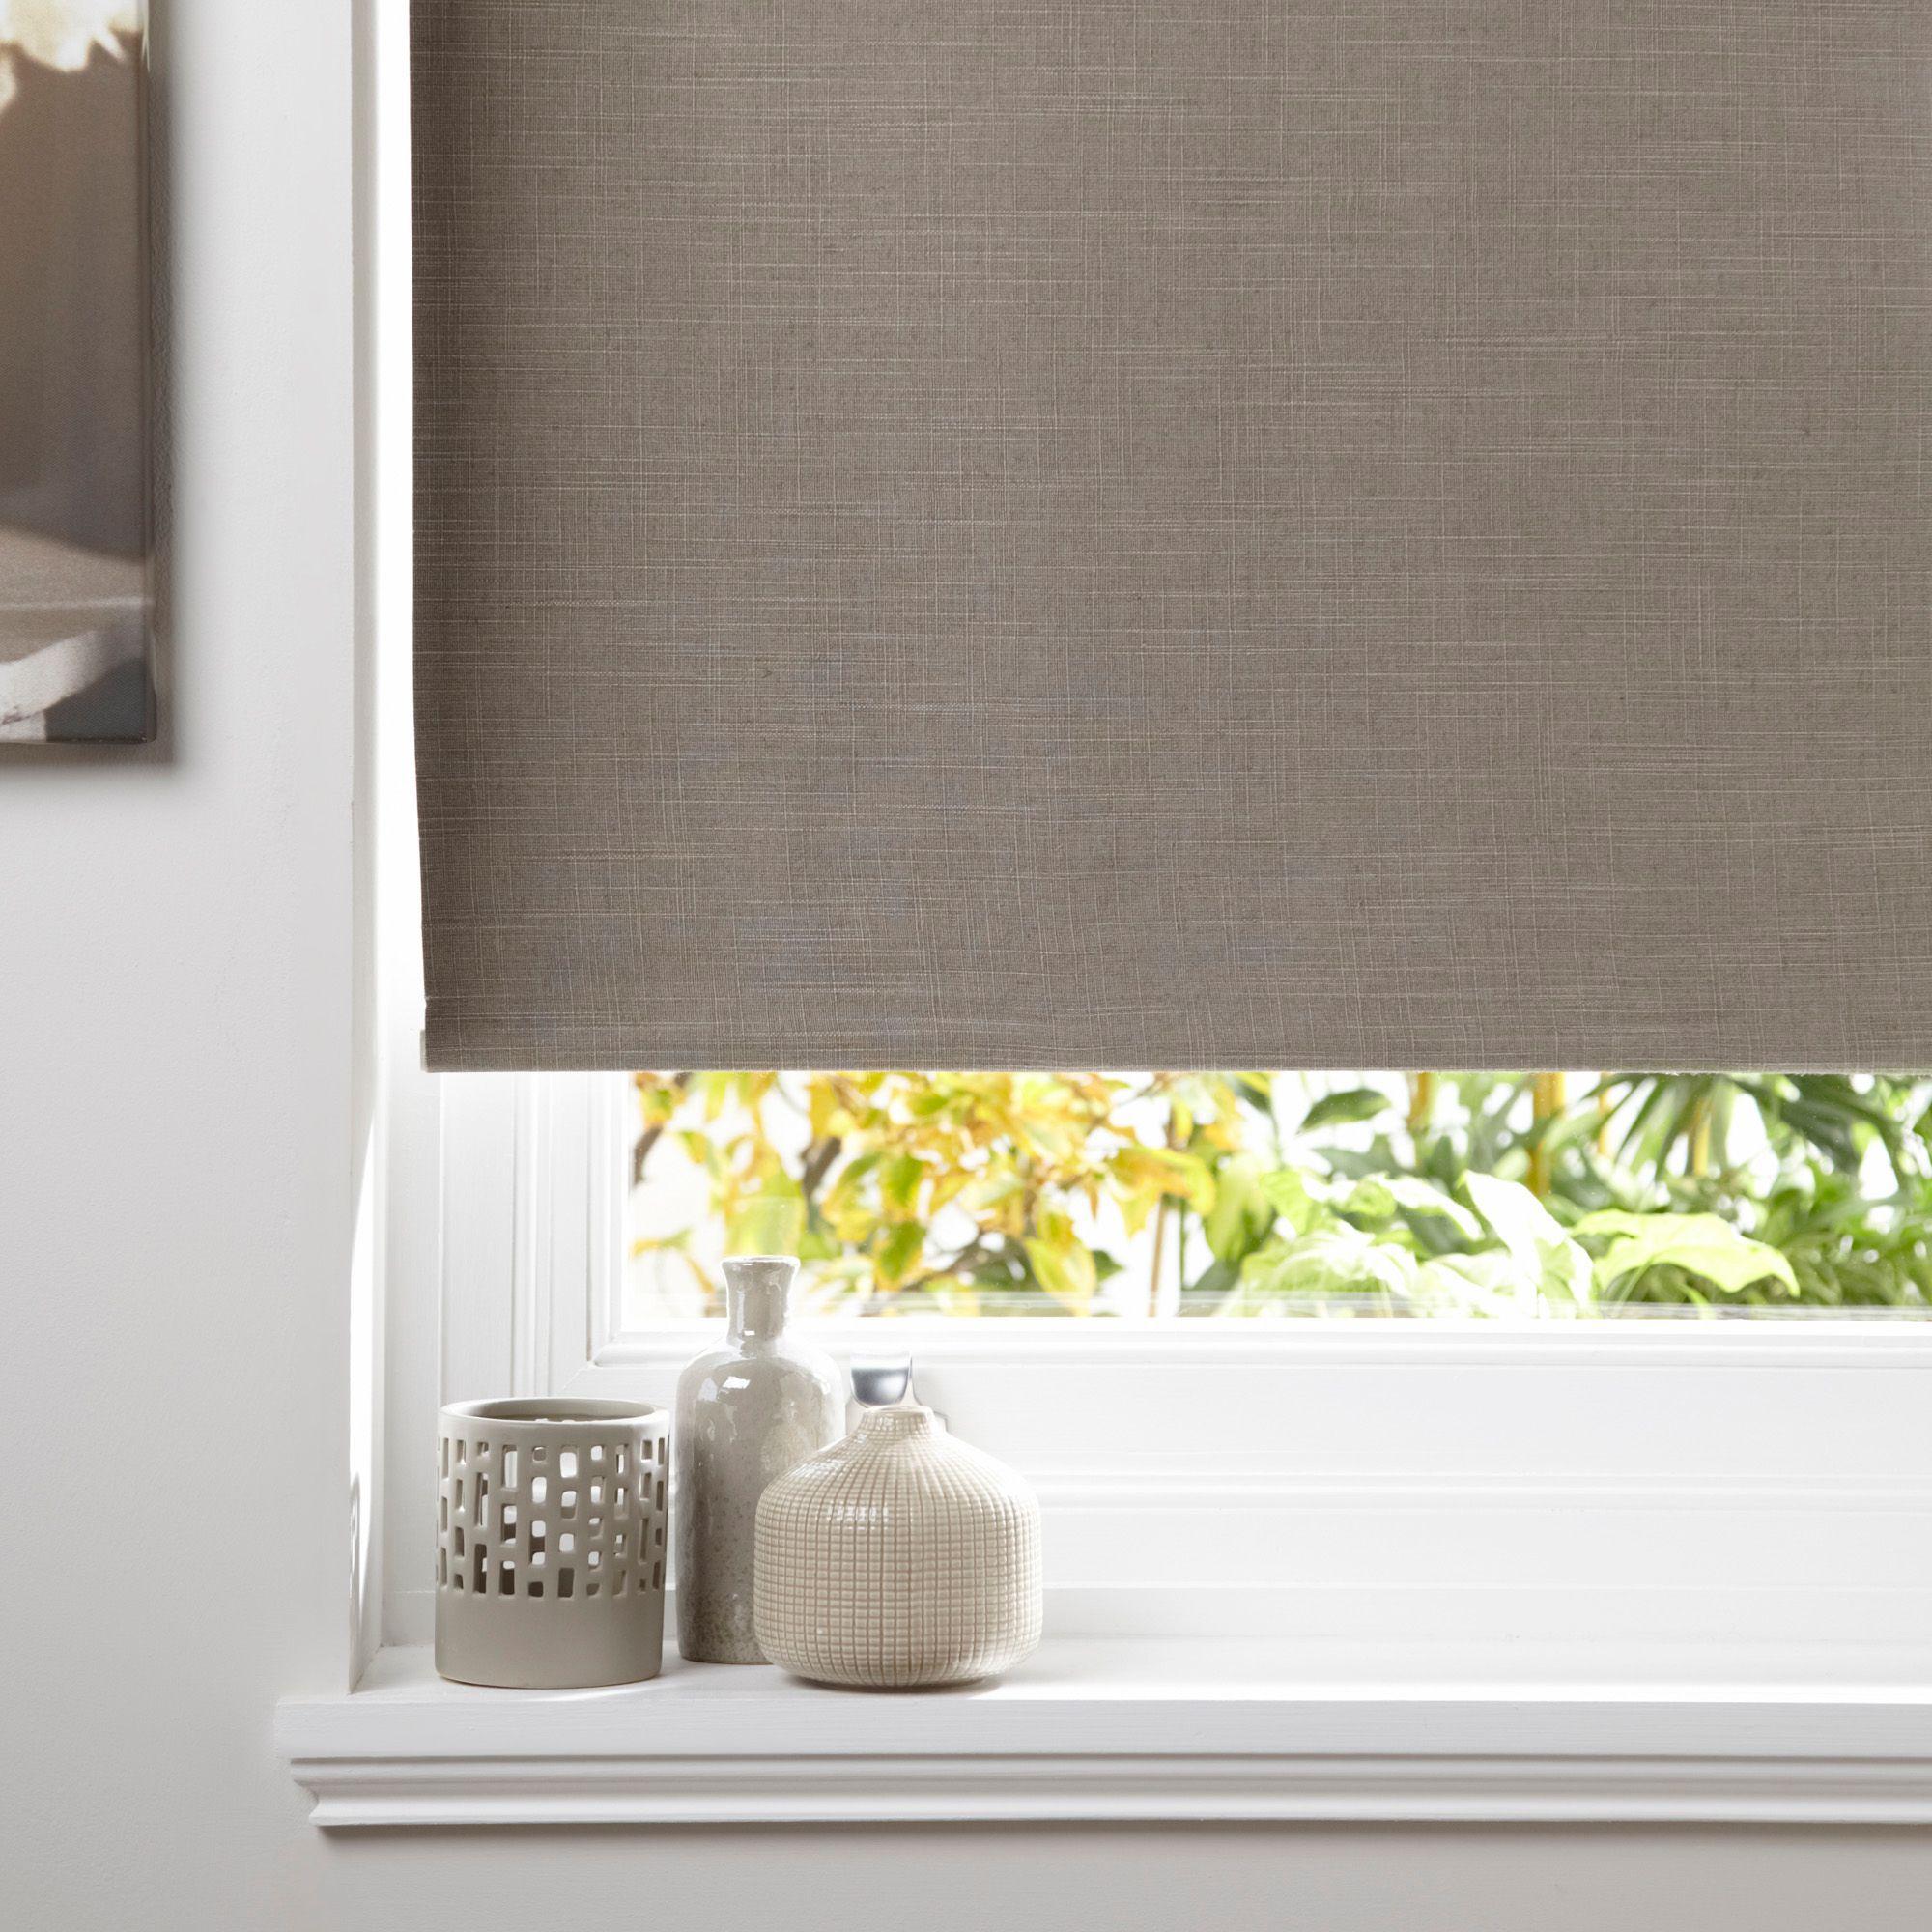 Bathroom Window Blinds B&Q colours taku corded seine roller blind (l)160 cm (w)120 cm